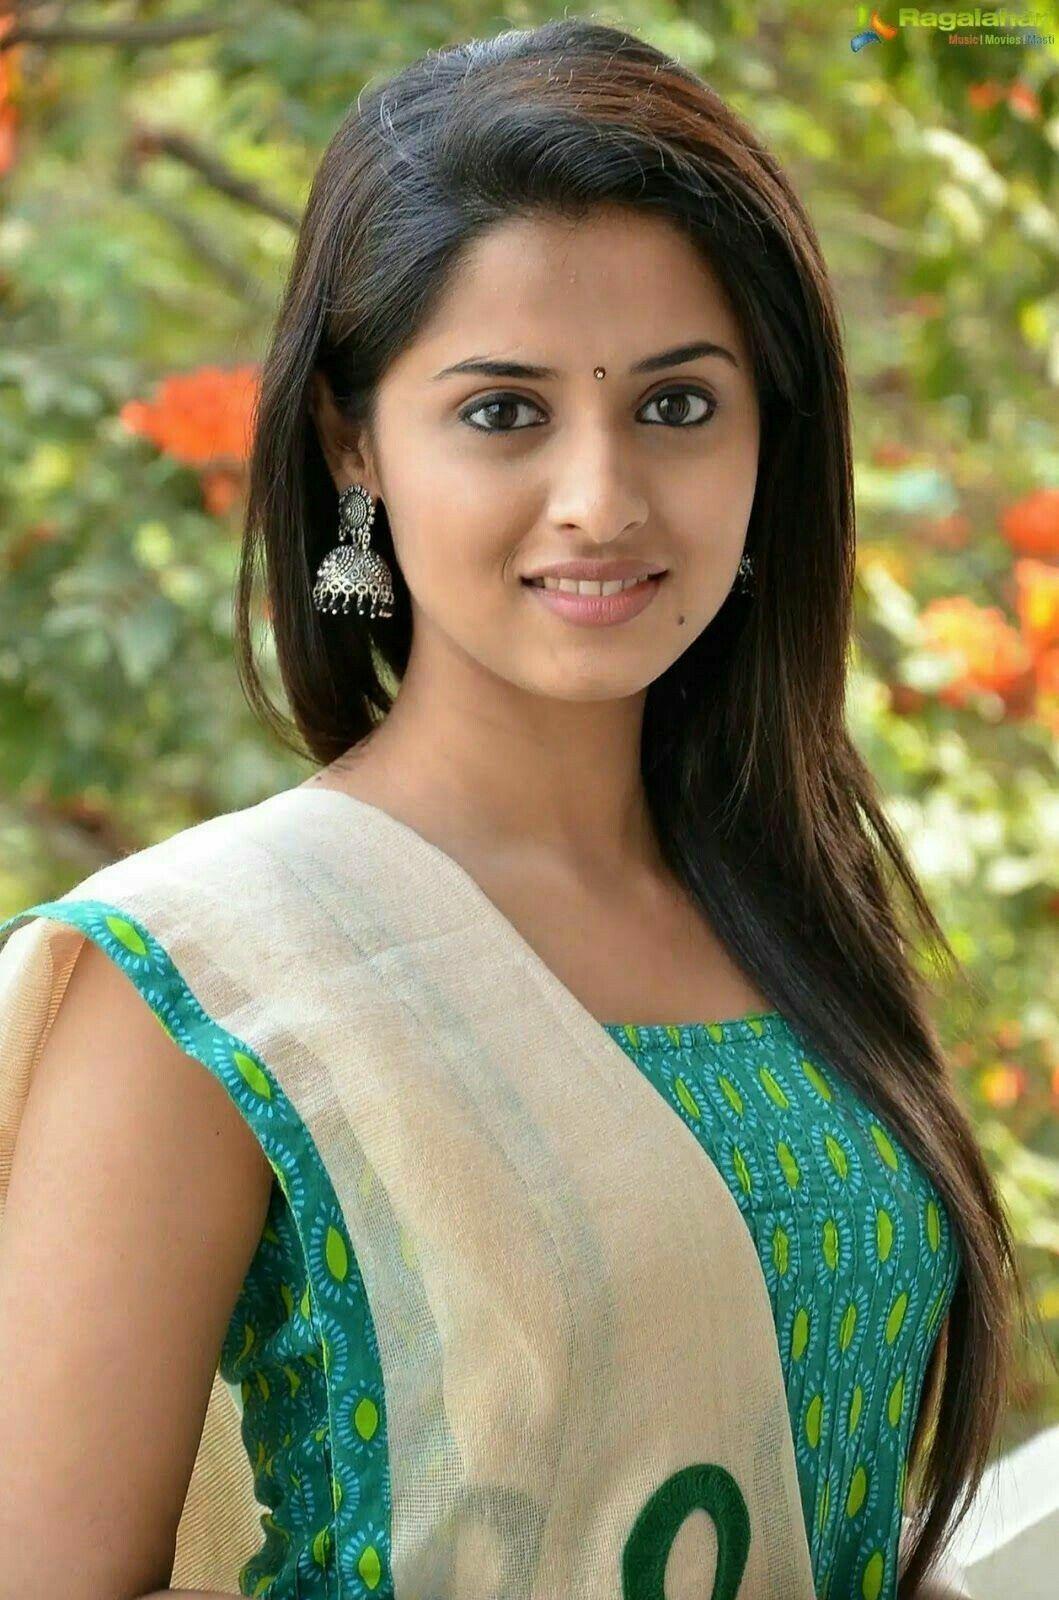 Indian beautiful girl photo-6989